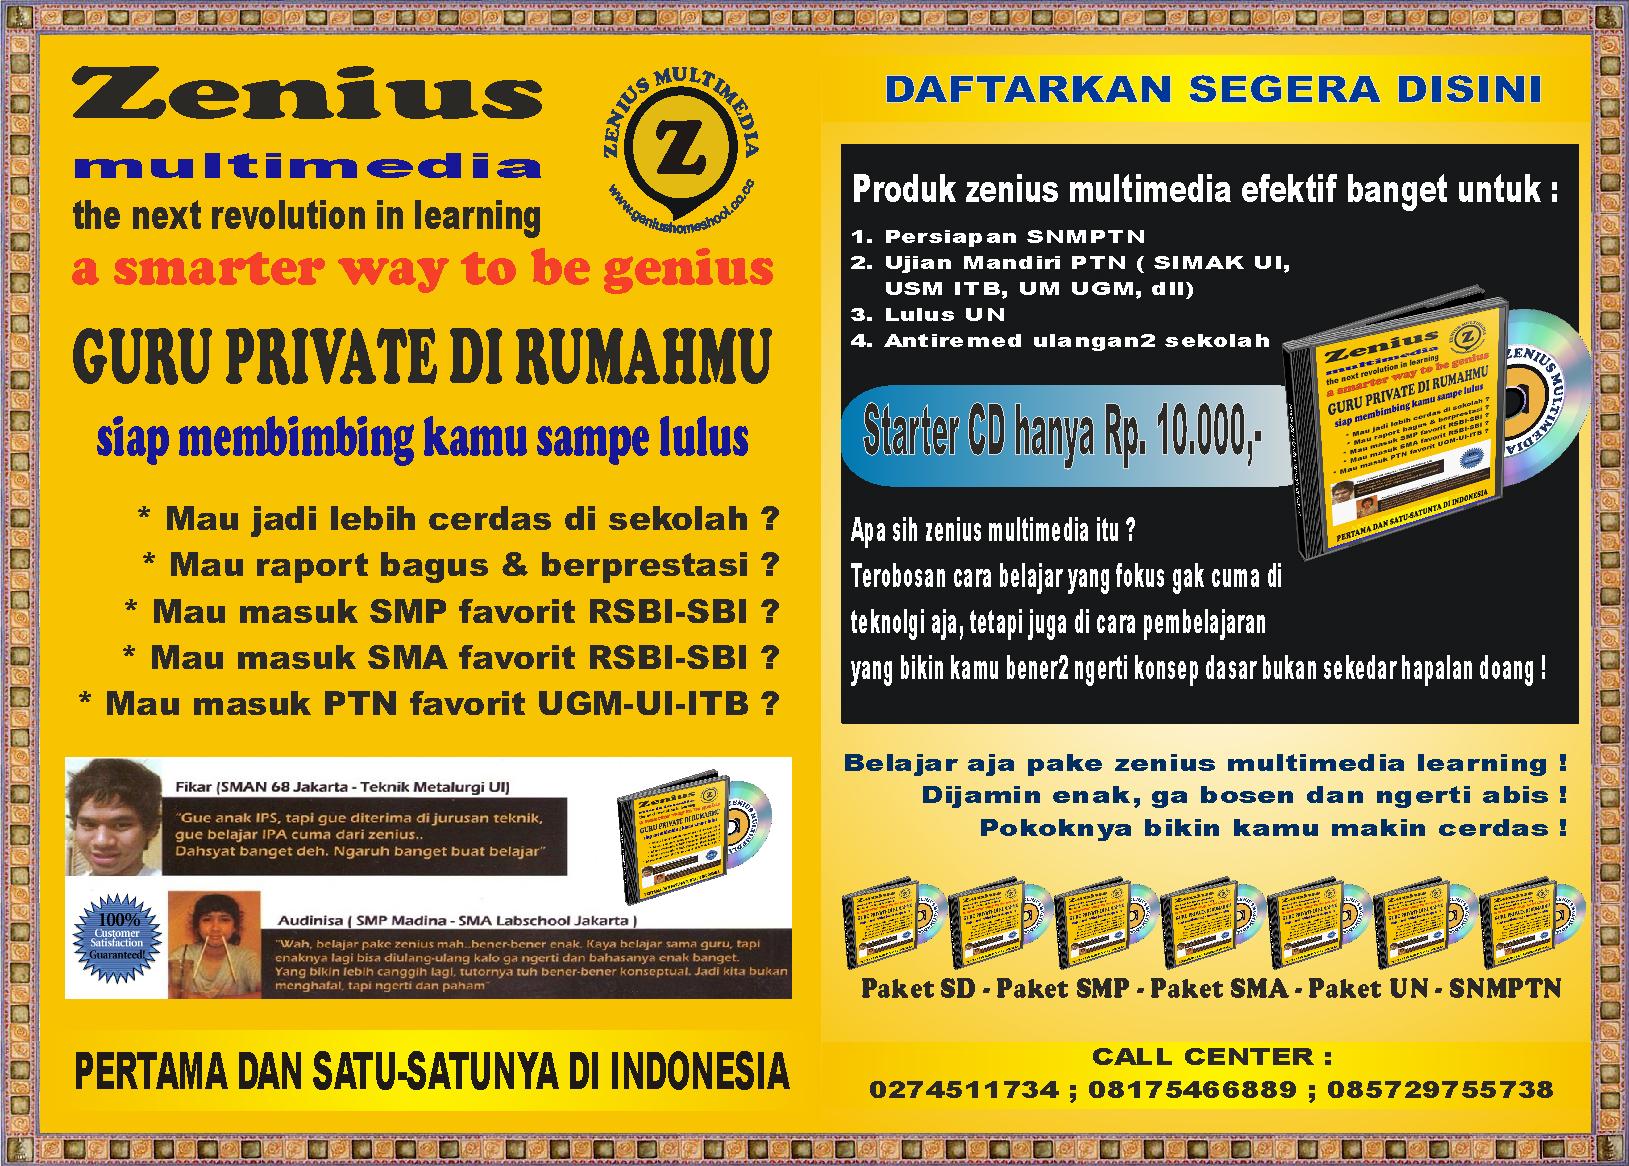 Rpp Bahasa Indonesia Kurikulum 2013 Kelas 7 8 9 Smp